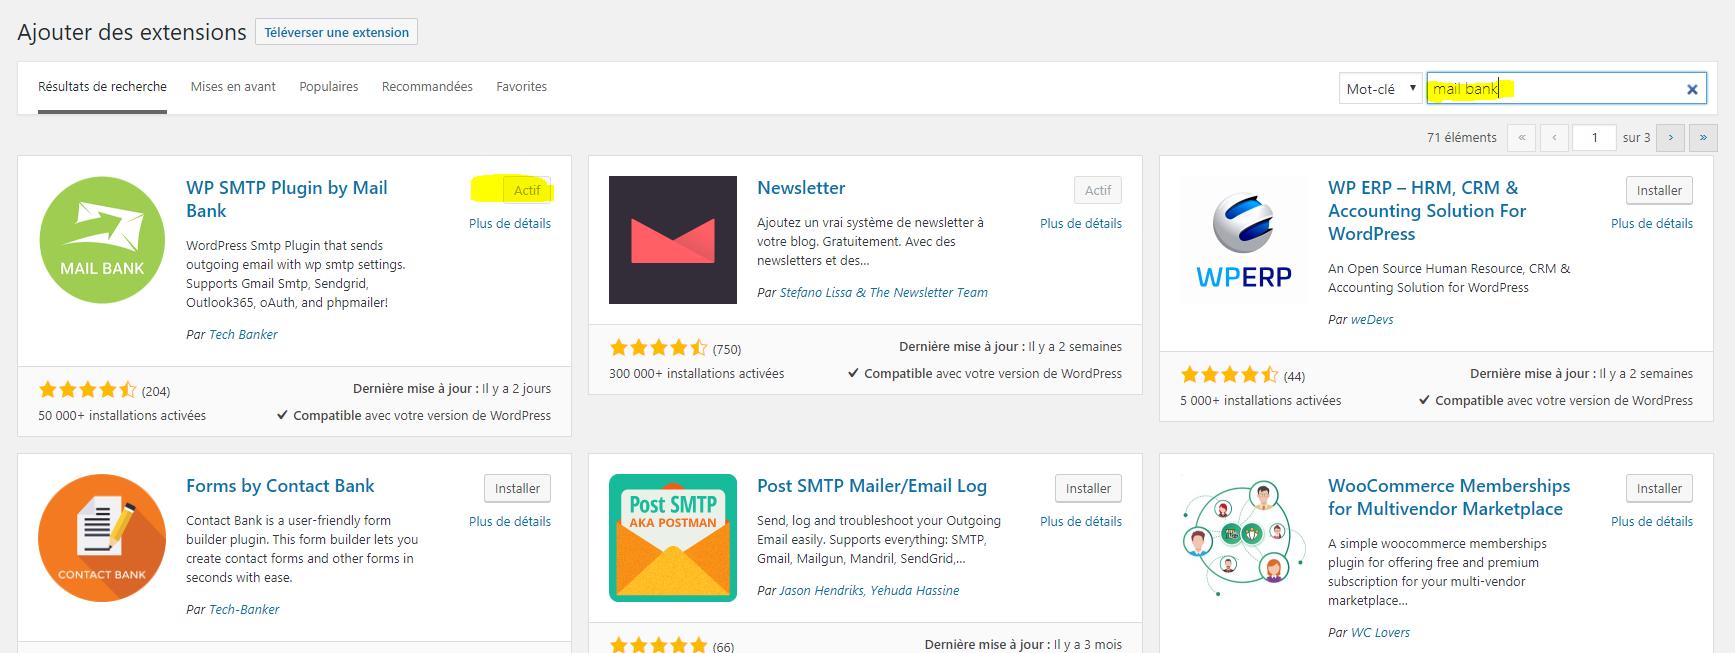 On a testé Mail bank un plug-in WordPress envoyer ses mails via SMTP